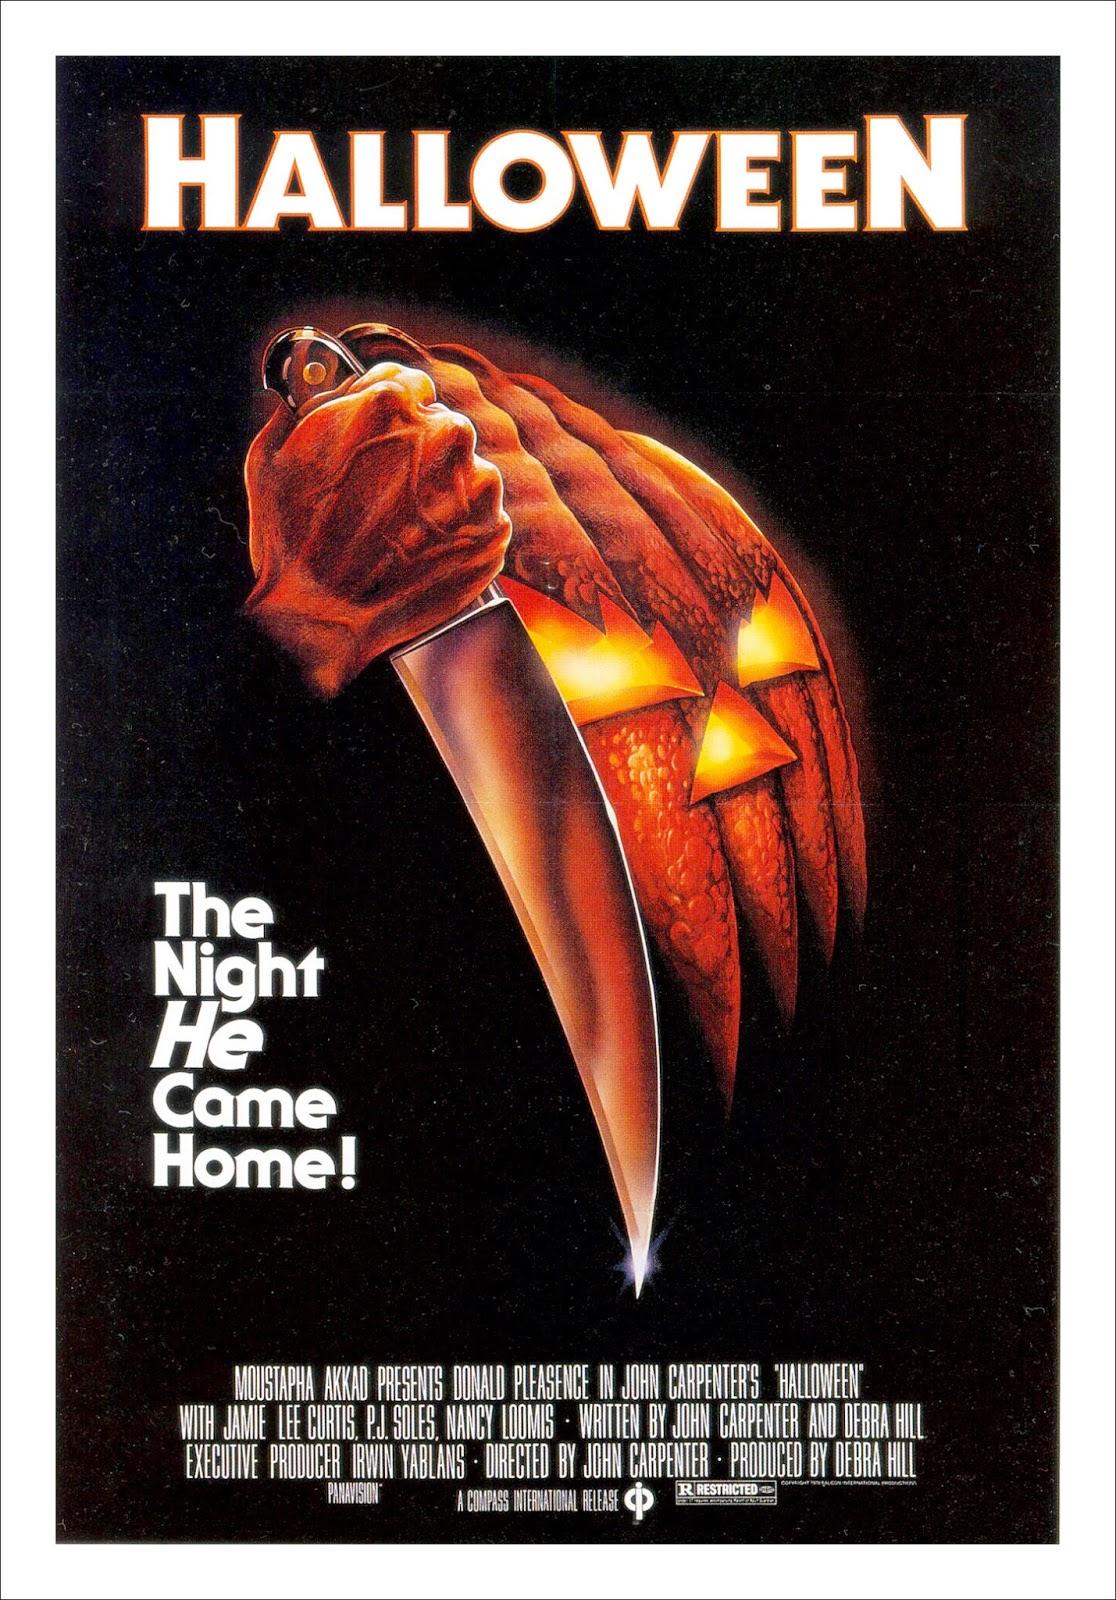 Halloween (1978) BrRip Audio Ingles,Esp. Latino,Castellano